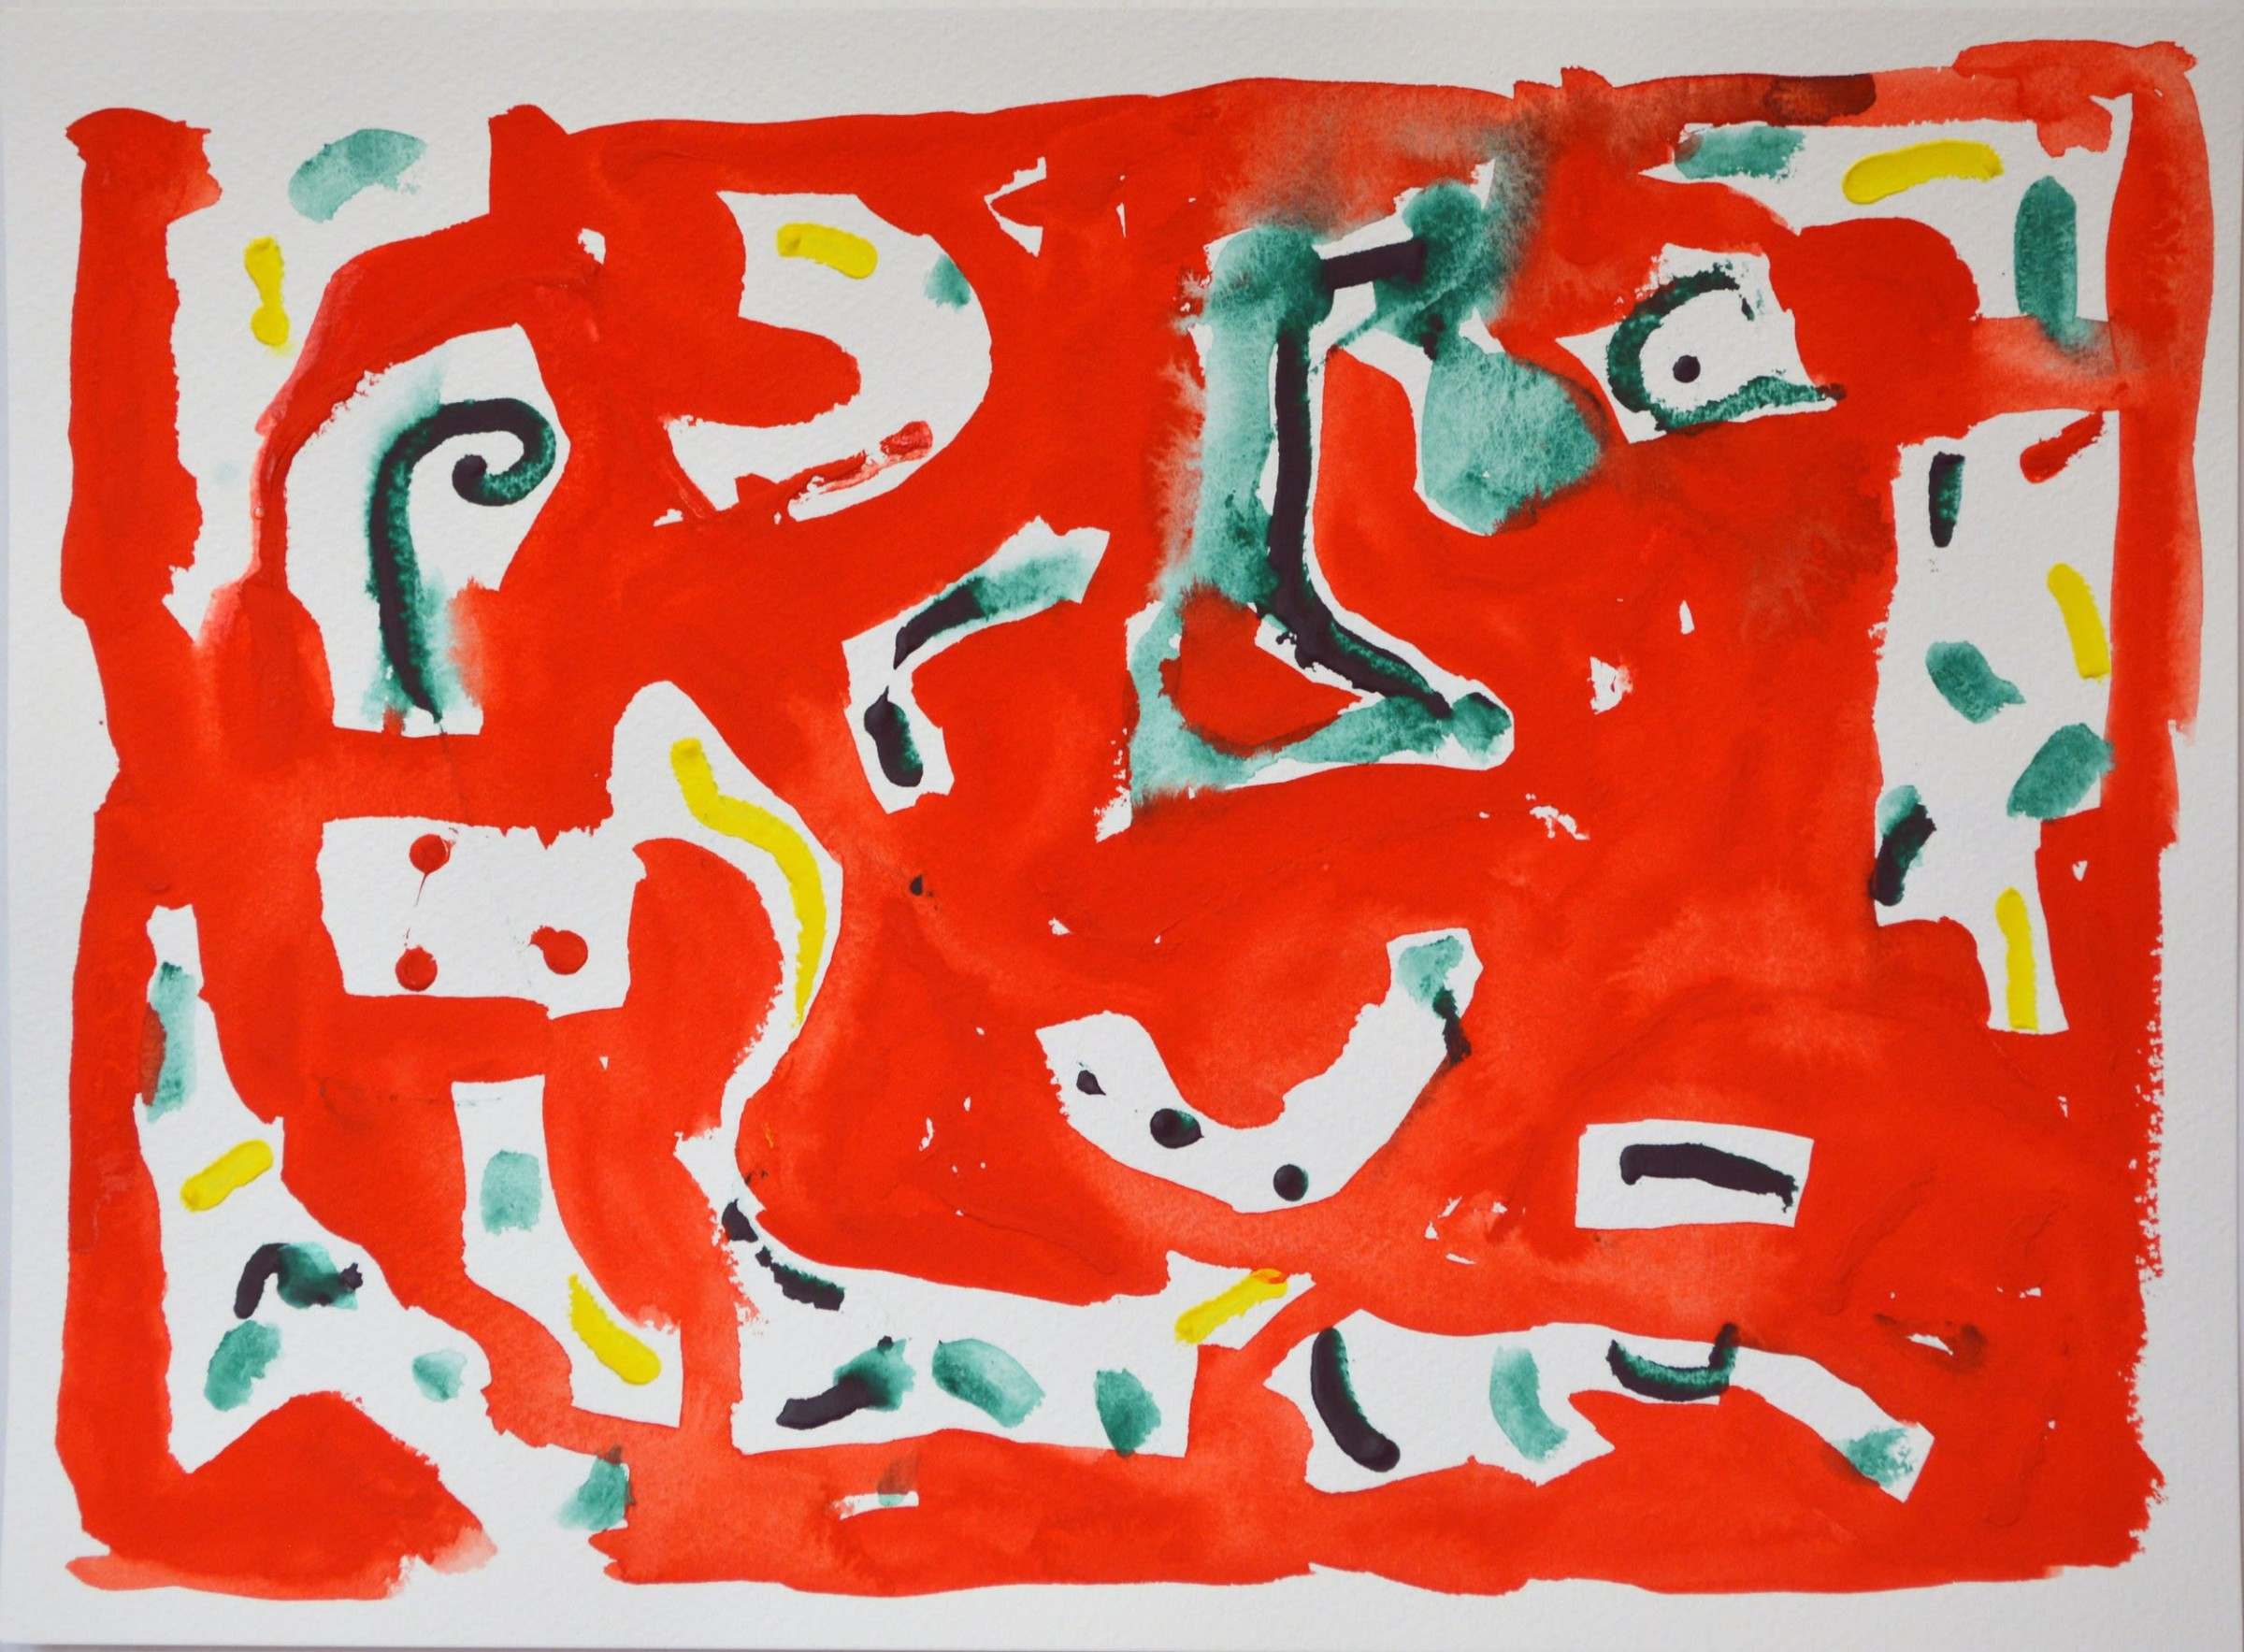 "<span class=""link fancybox-details-link""><a href=""/artists/32-james-faure-walker/works/12573-james-faure-walker-red-january-5-2021-no.-1/"">View Detail Page</a></span><div class=""artist""><span class=""artist""><strong>James Faure Walker</strong></span></div><div class=""title""><em>Red January 5, 2021, No. 1</em></div><div class=""medium"">gouache</div><div class=""dimensions"">Artwork: 38 x 28cm</div><div class=""price"">£450.00</div>"